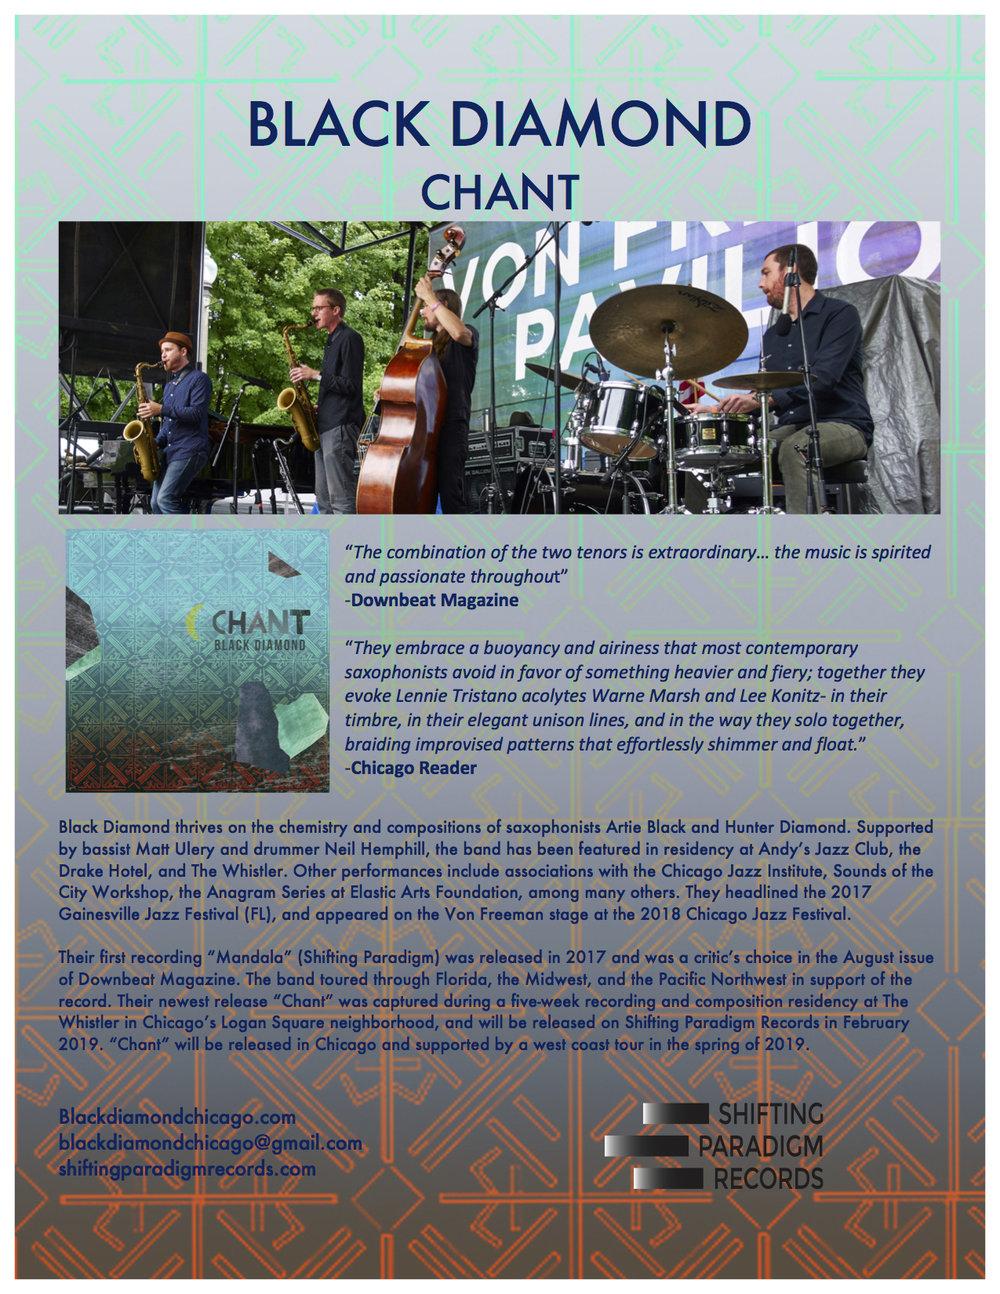 Chant one-sheet.jpg